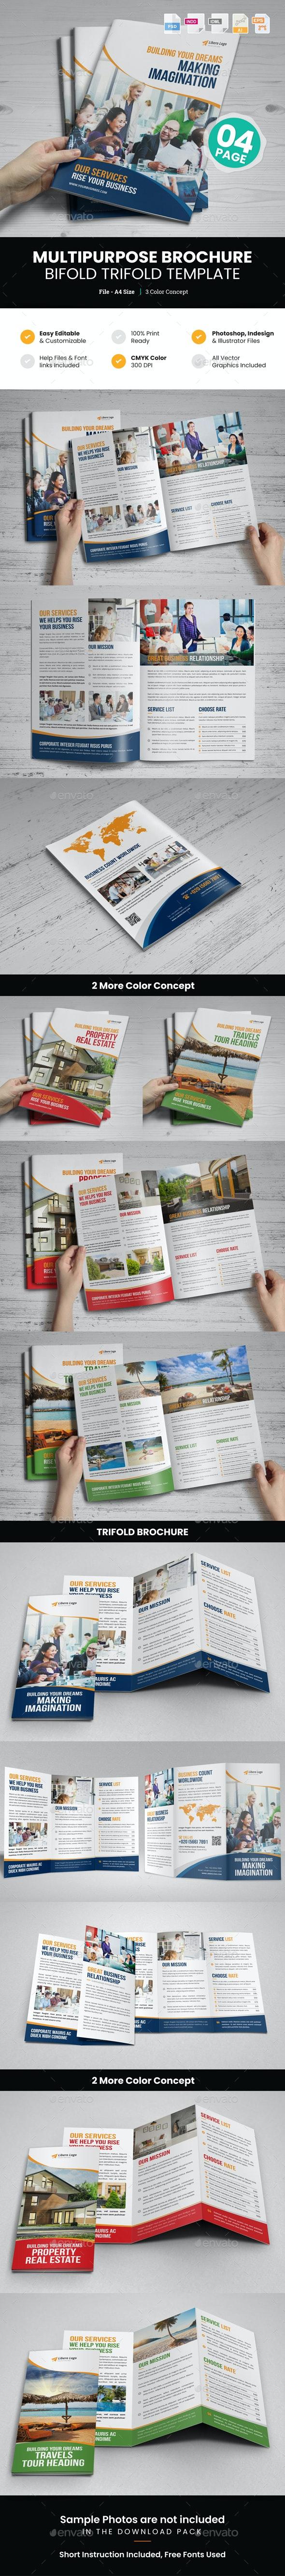 Multipurpose Bifold-Trifold Brochure v1 - Corporate Brochures